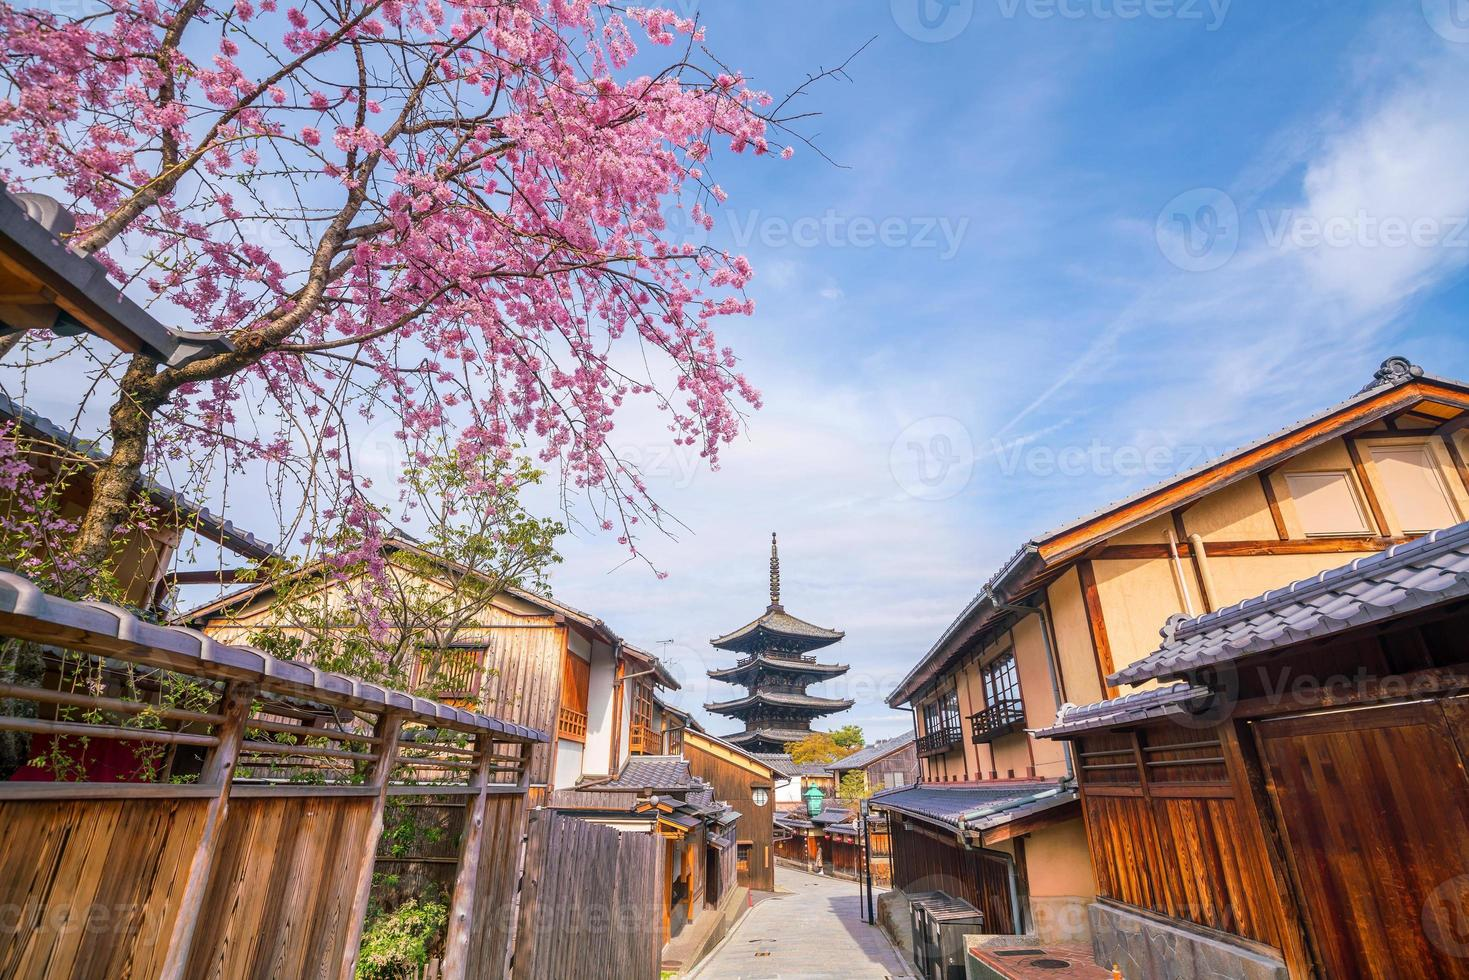 gamla stan kyoto under sakura säsong foto